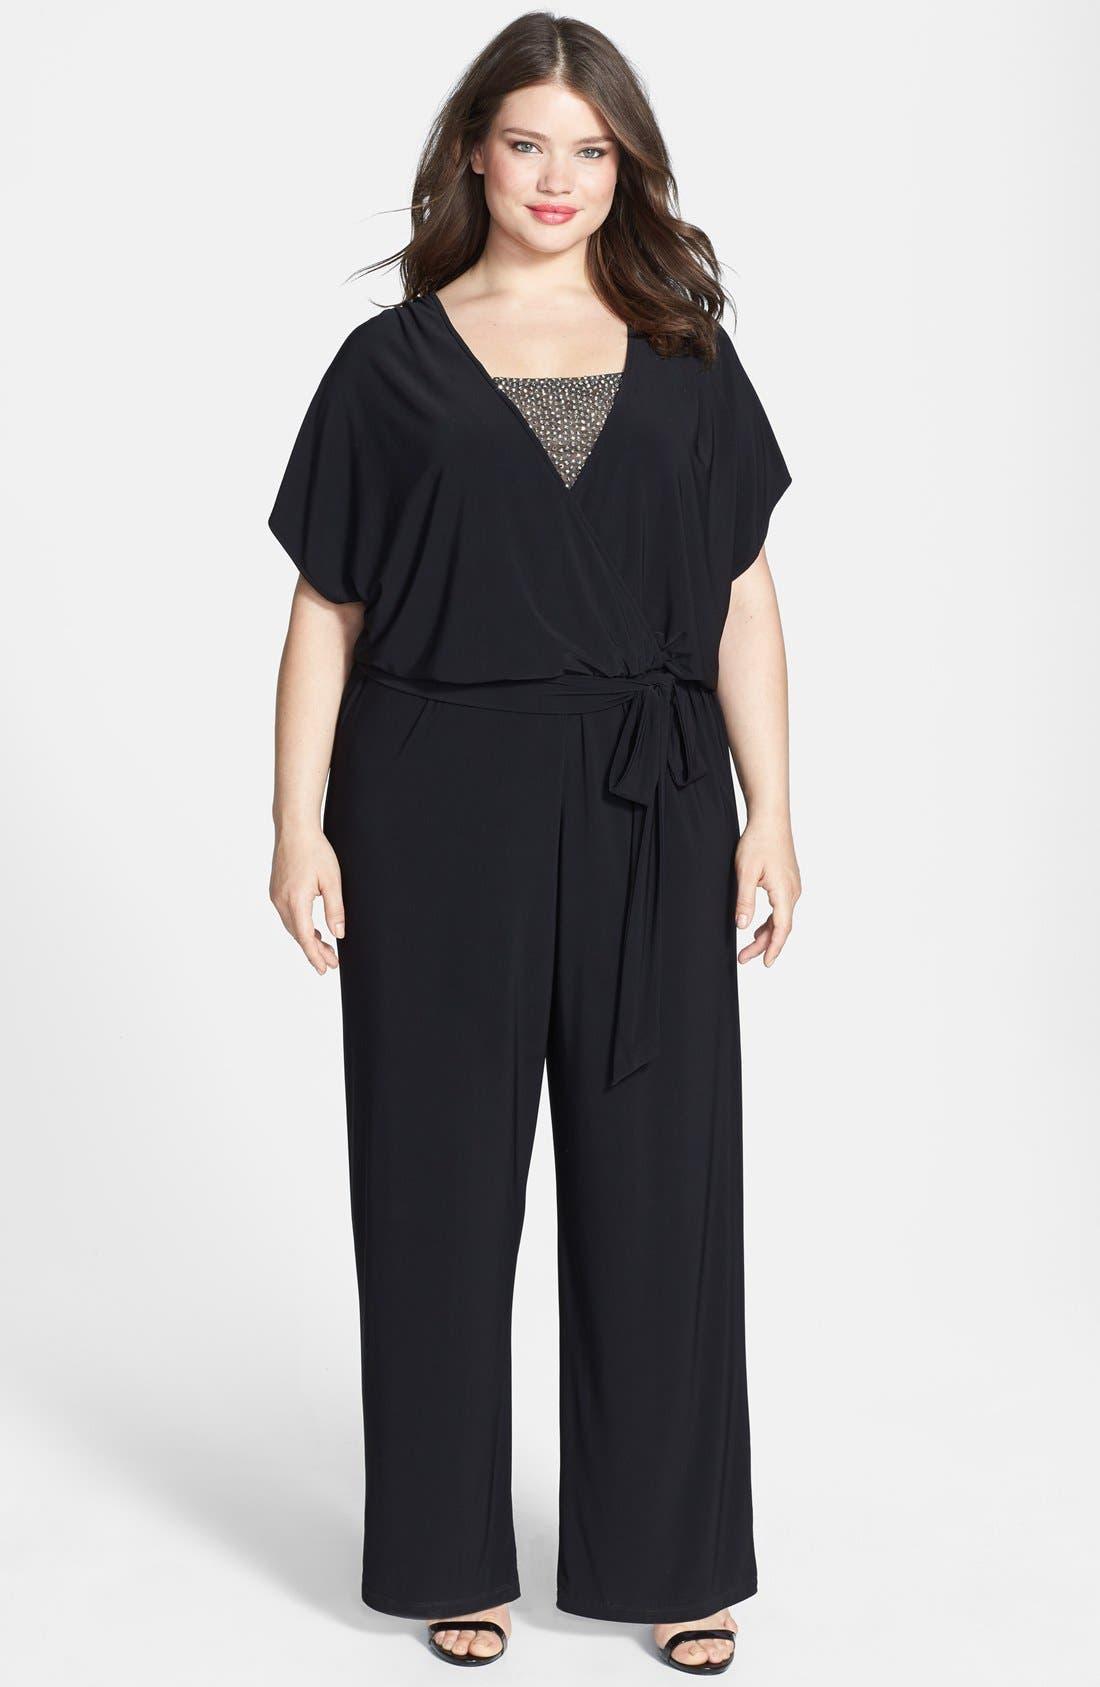 Main Image - Xscape Embellished Inset Blouson Jumpsuit (Plus Size)